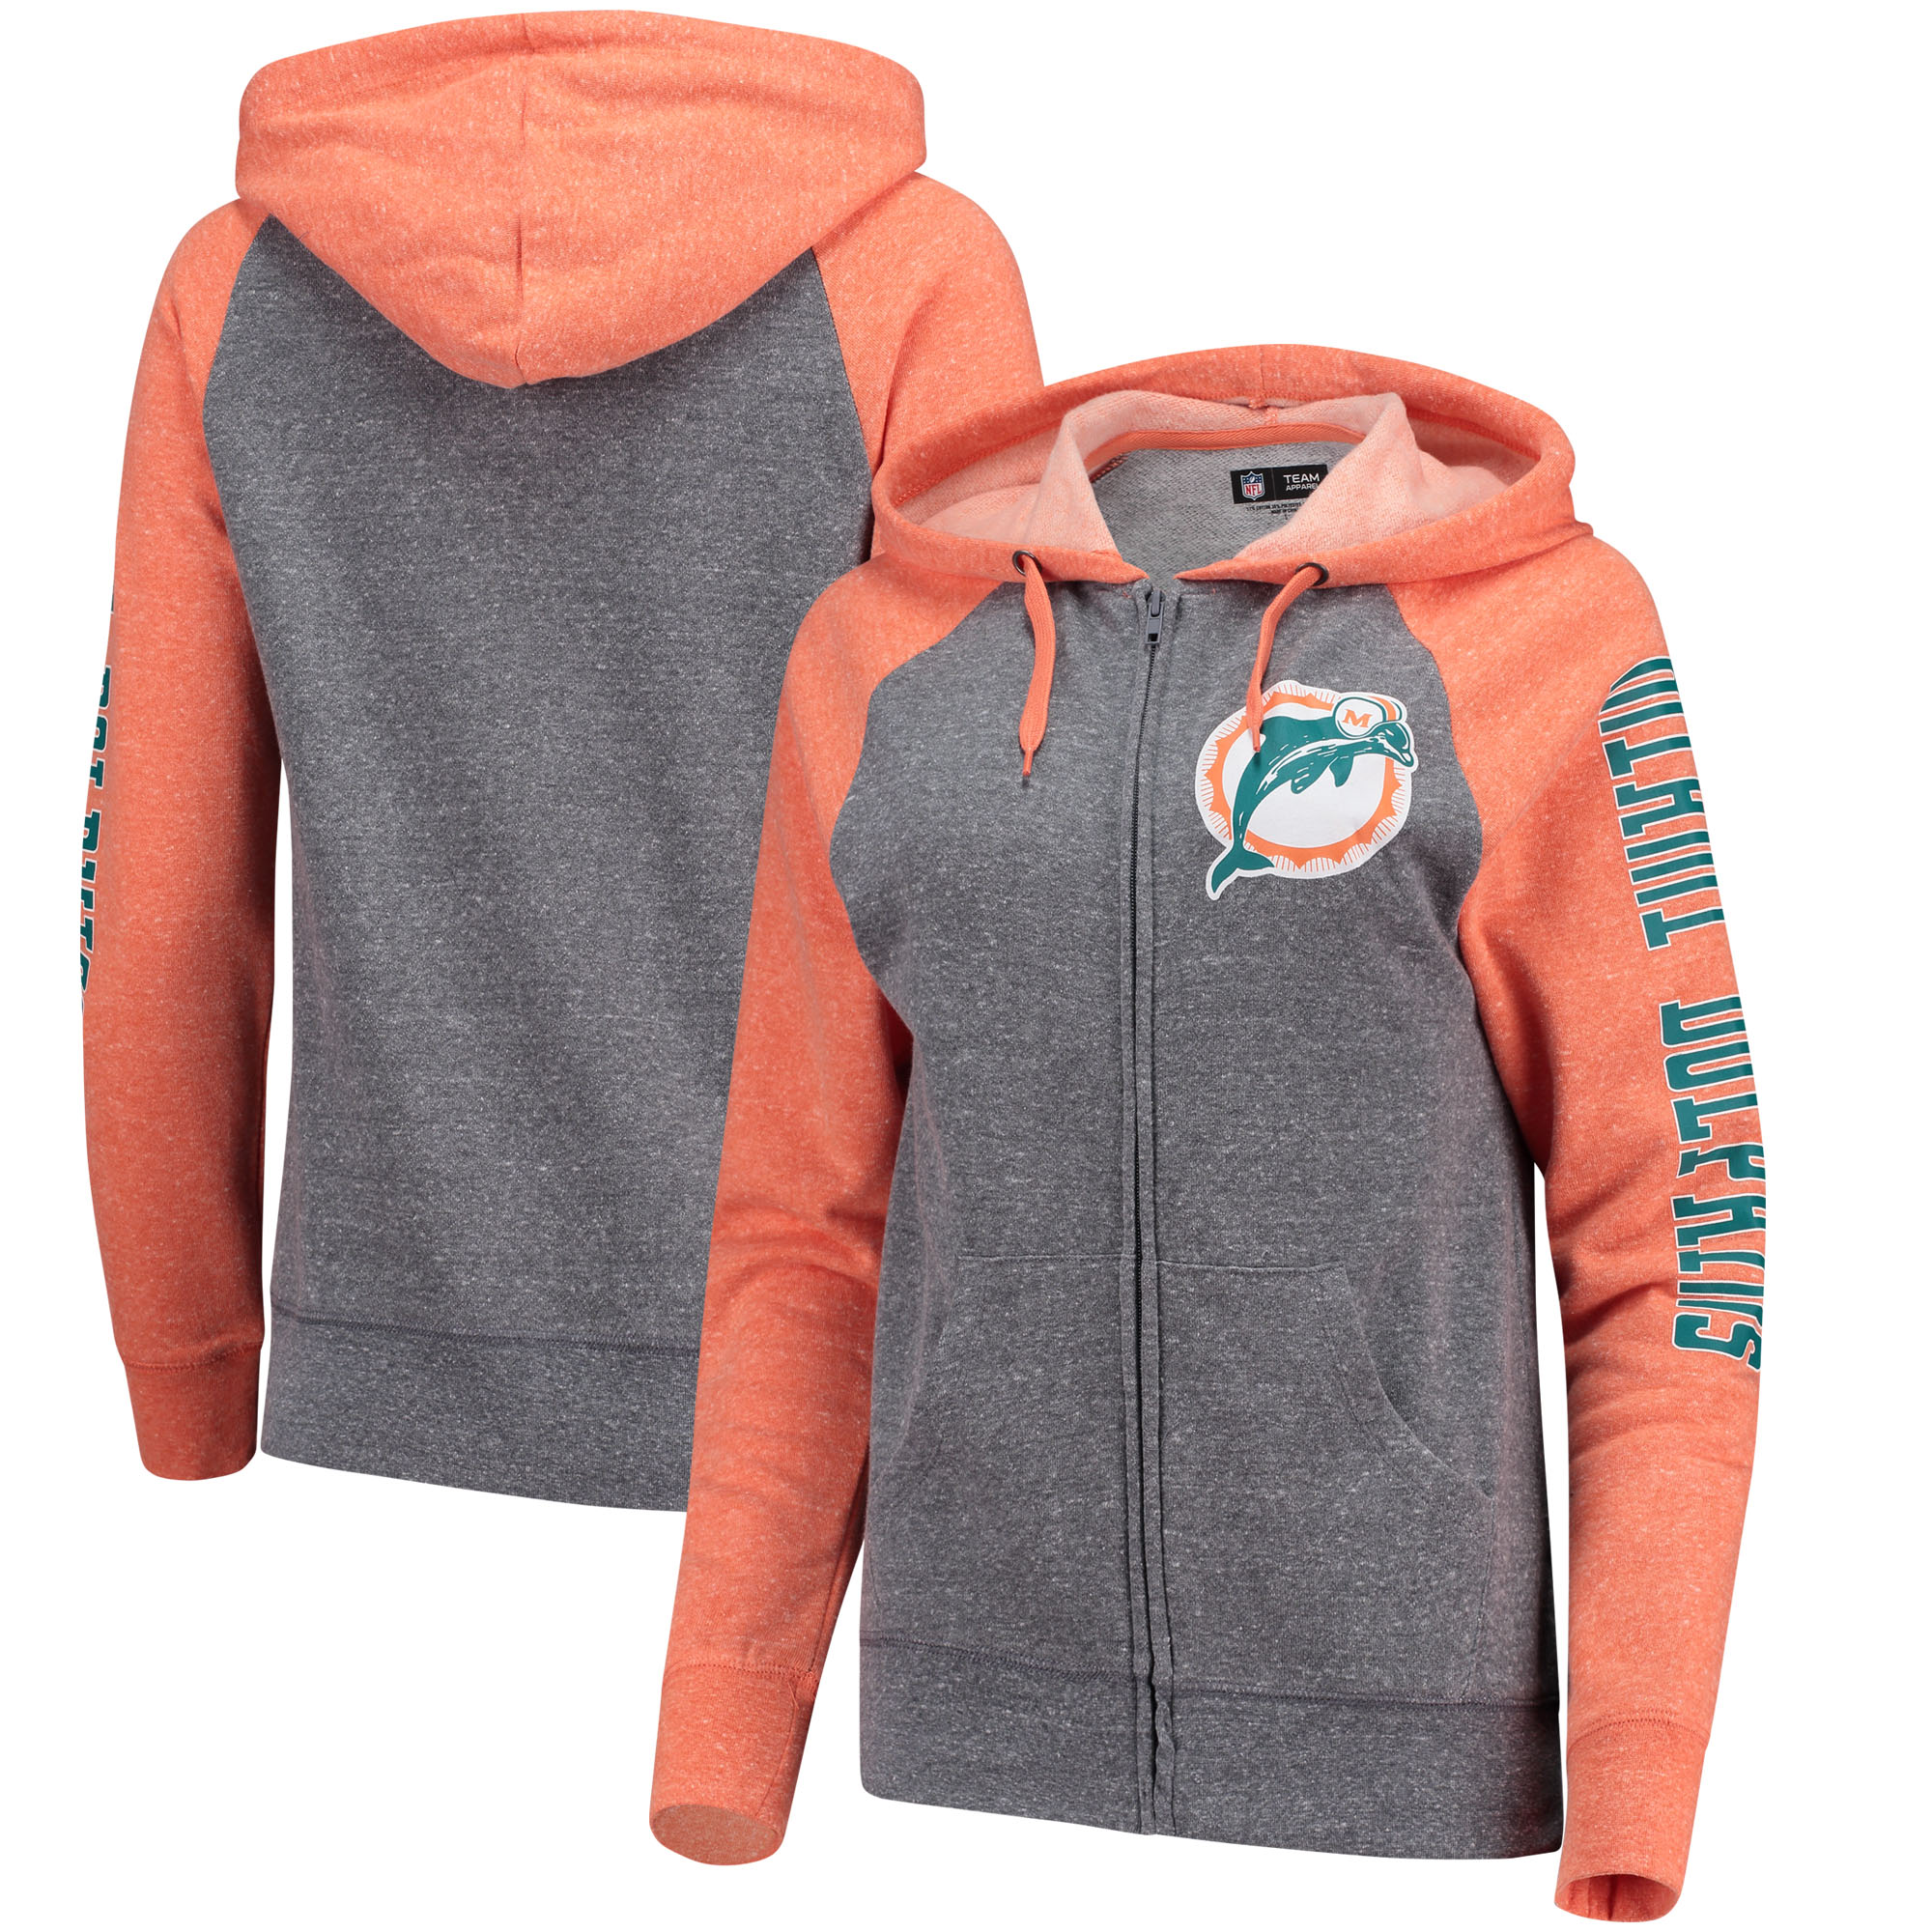 Miami Dolphins 5th & Ocean by New Era Women's Fleece Tri-Blend Raglan Sleeve Full-Zip Hoodie - Heathered Gray/Orange